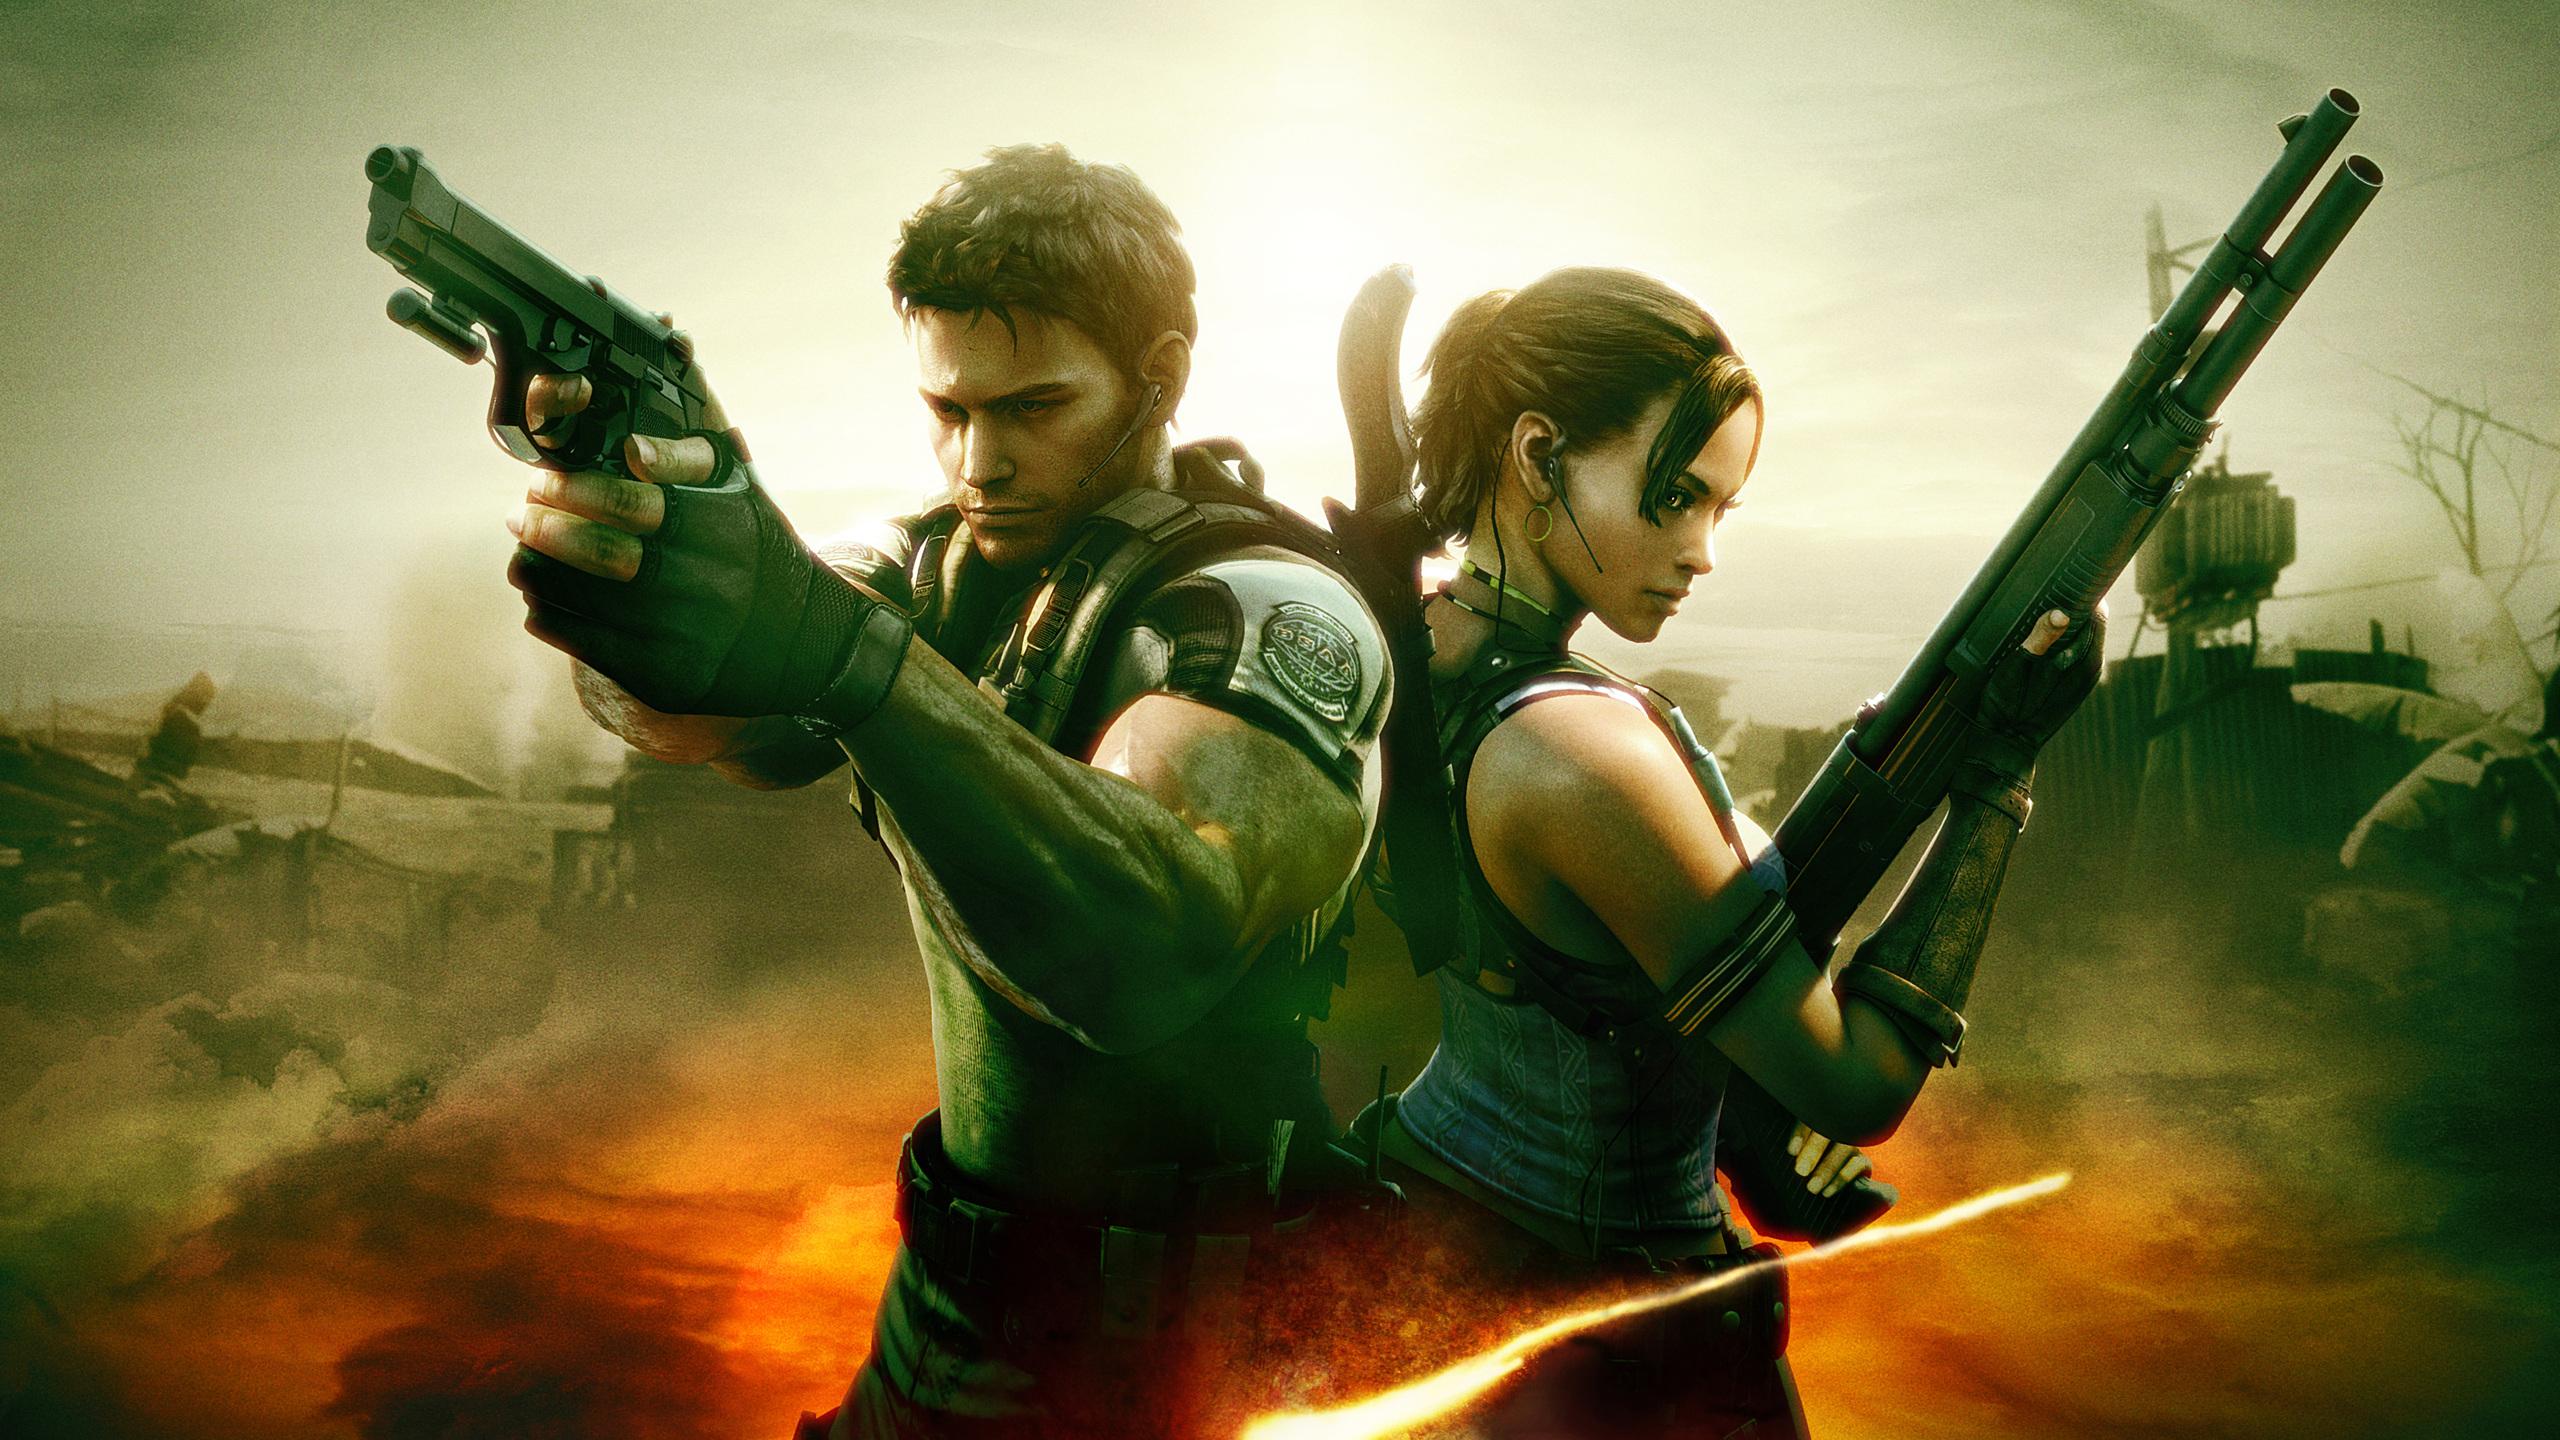 2560x1440 Resident Evil 5 4k 1440p Resolution Hd 4k Wallpapers